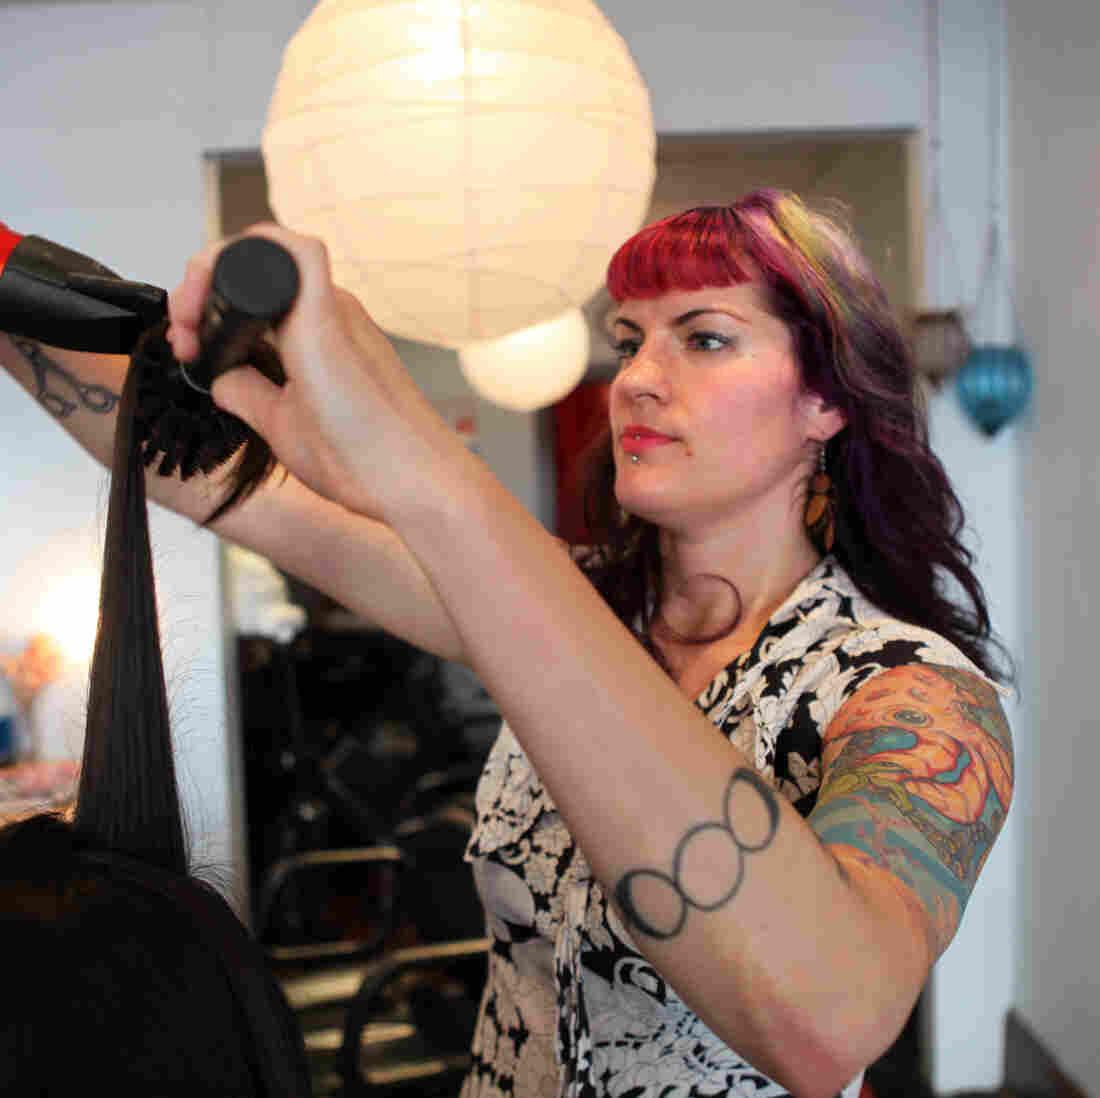 An Explicit Contract Makes Surrogacy Viable For An Oregon Woman